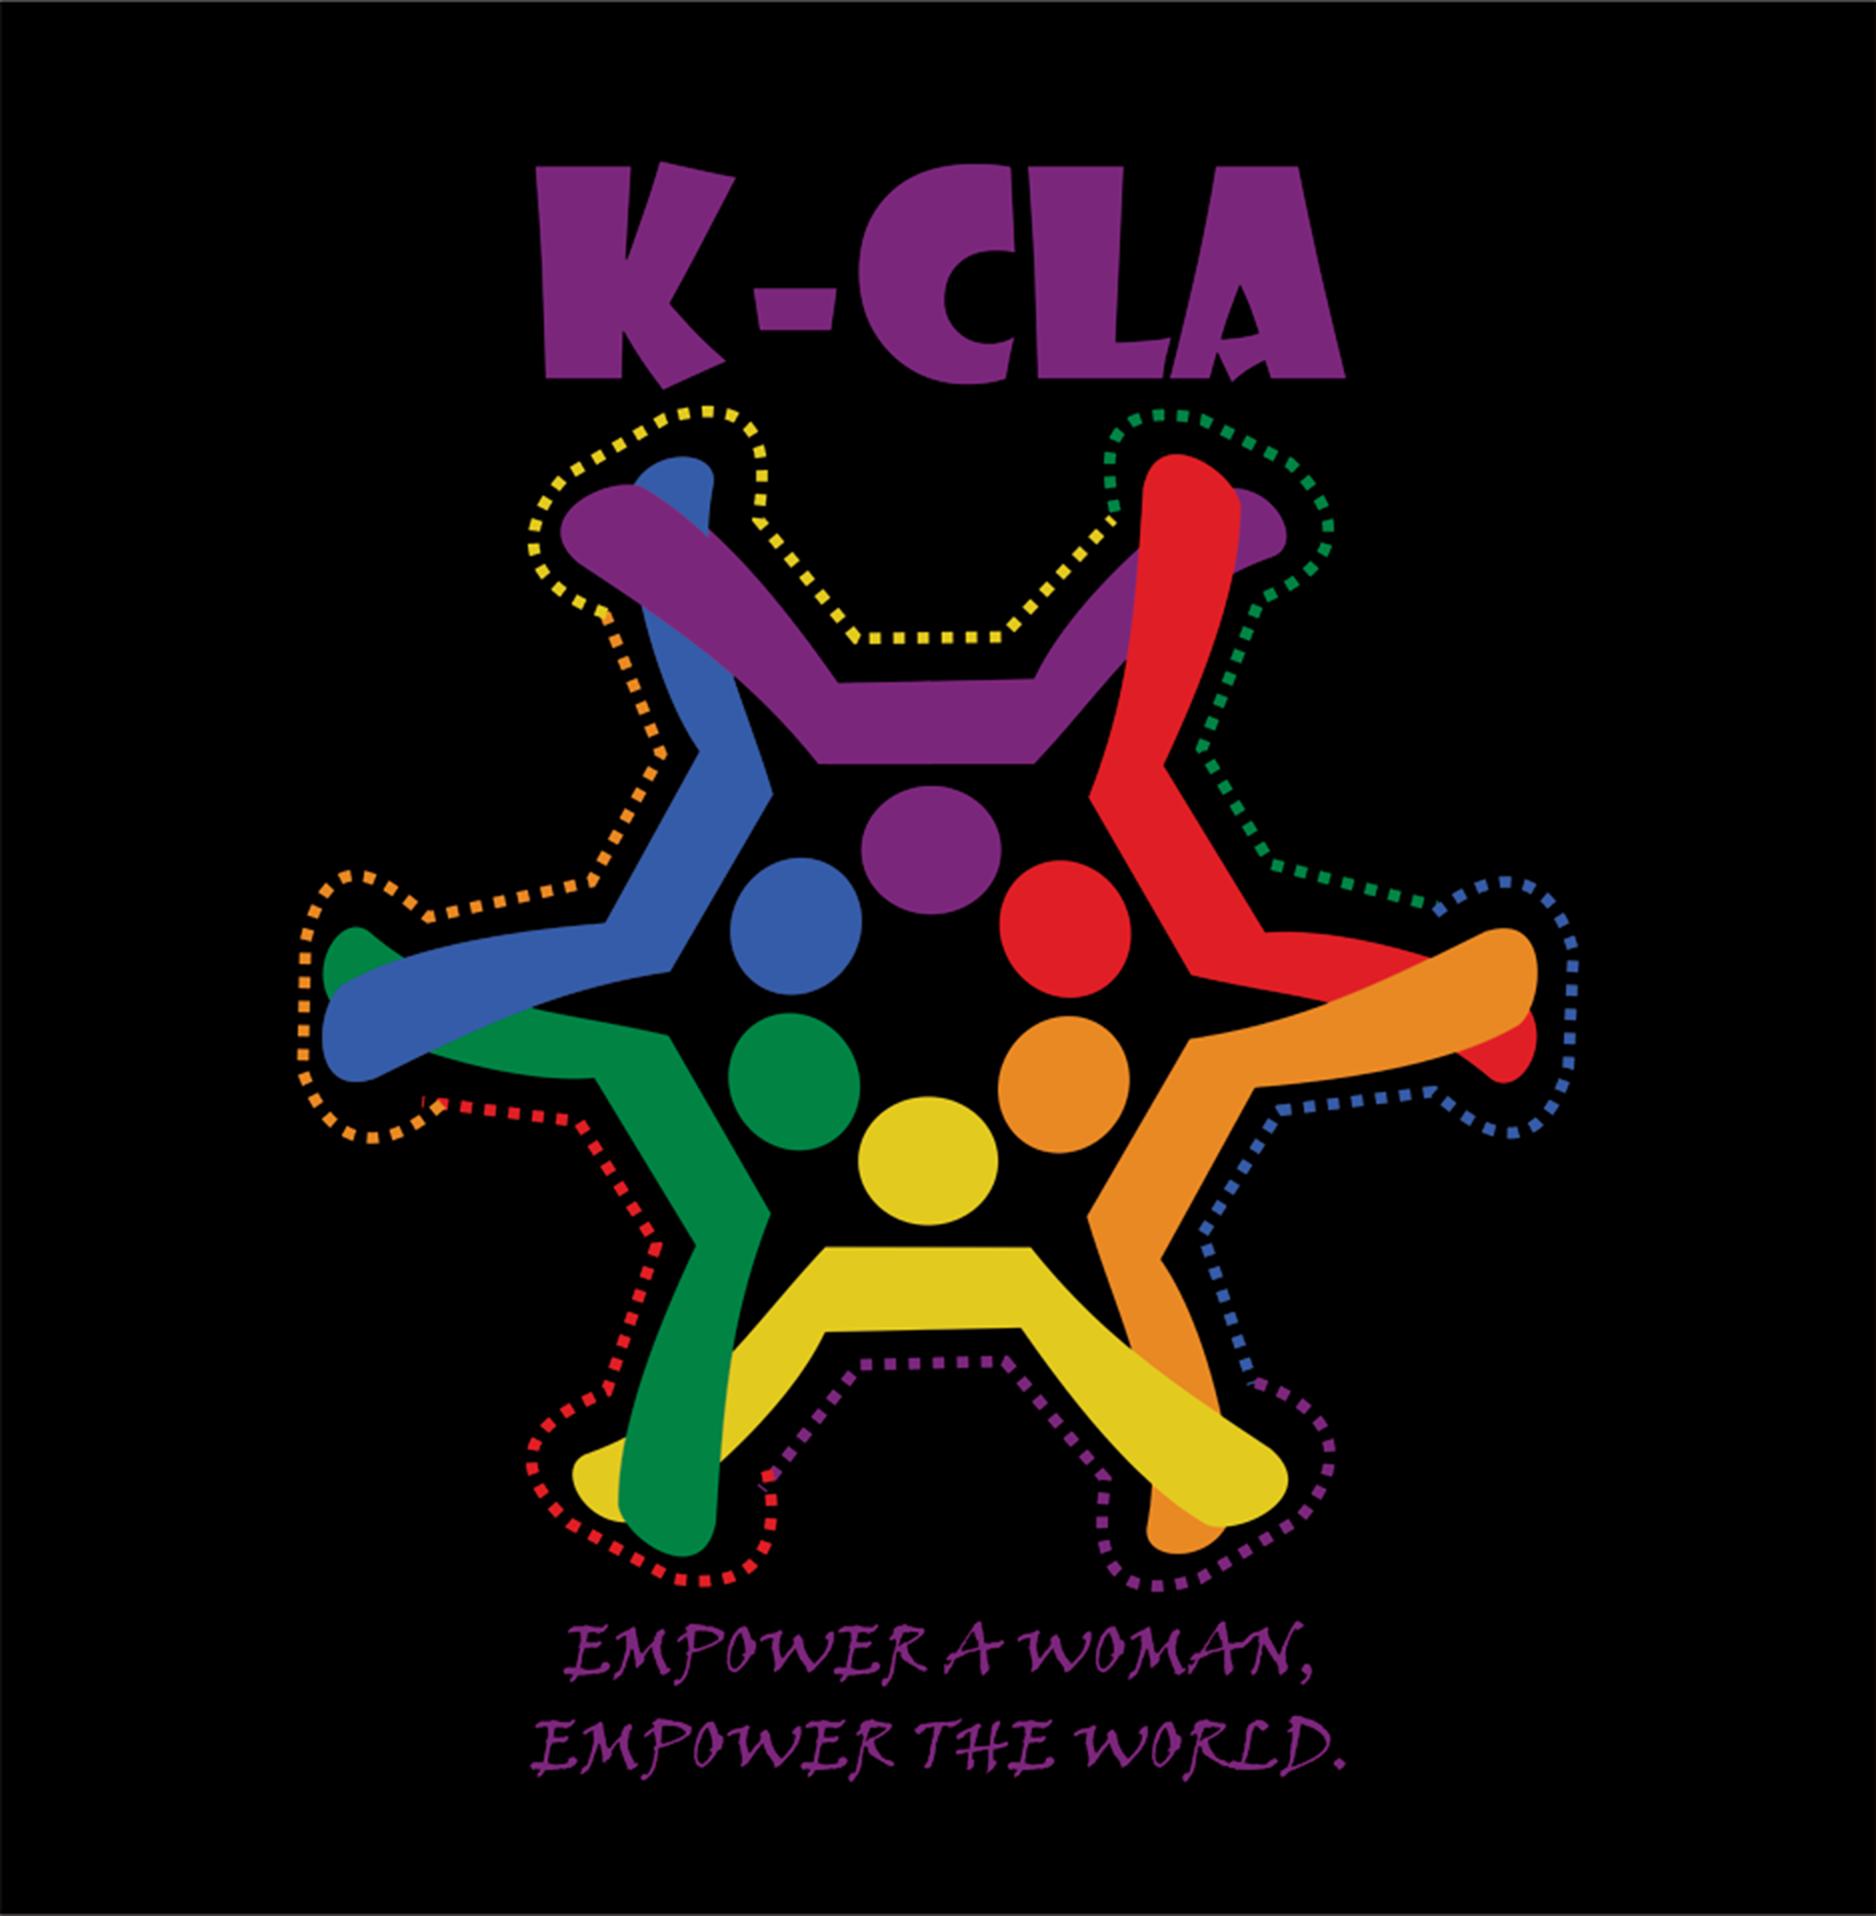 kcla-2